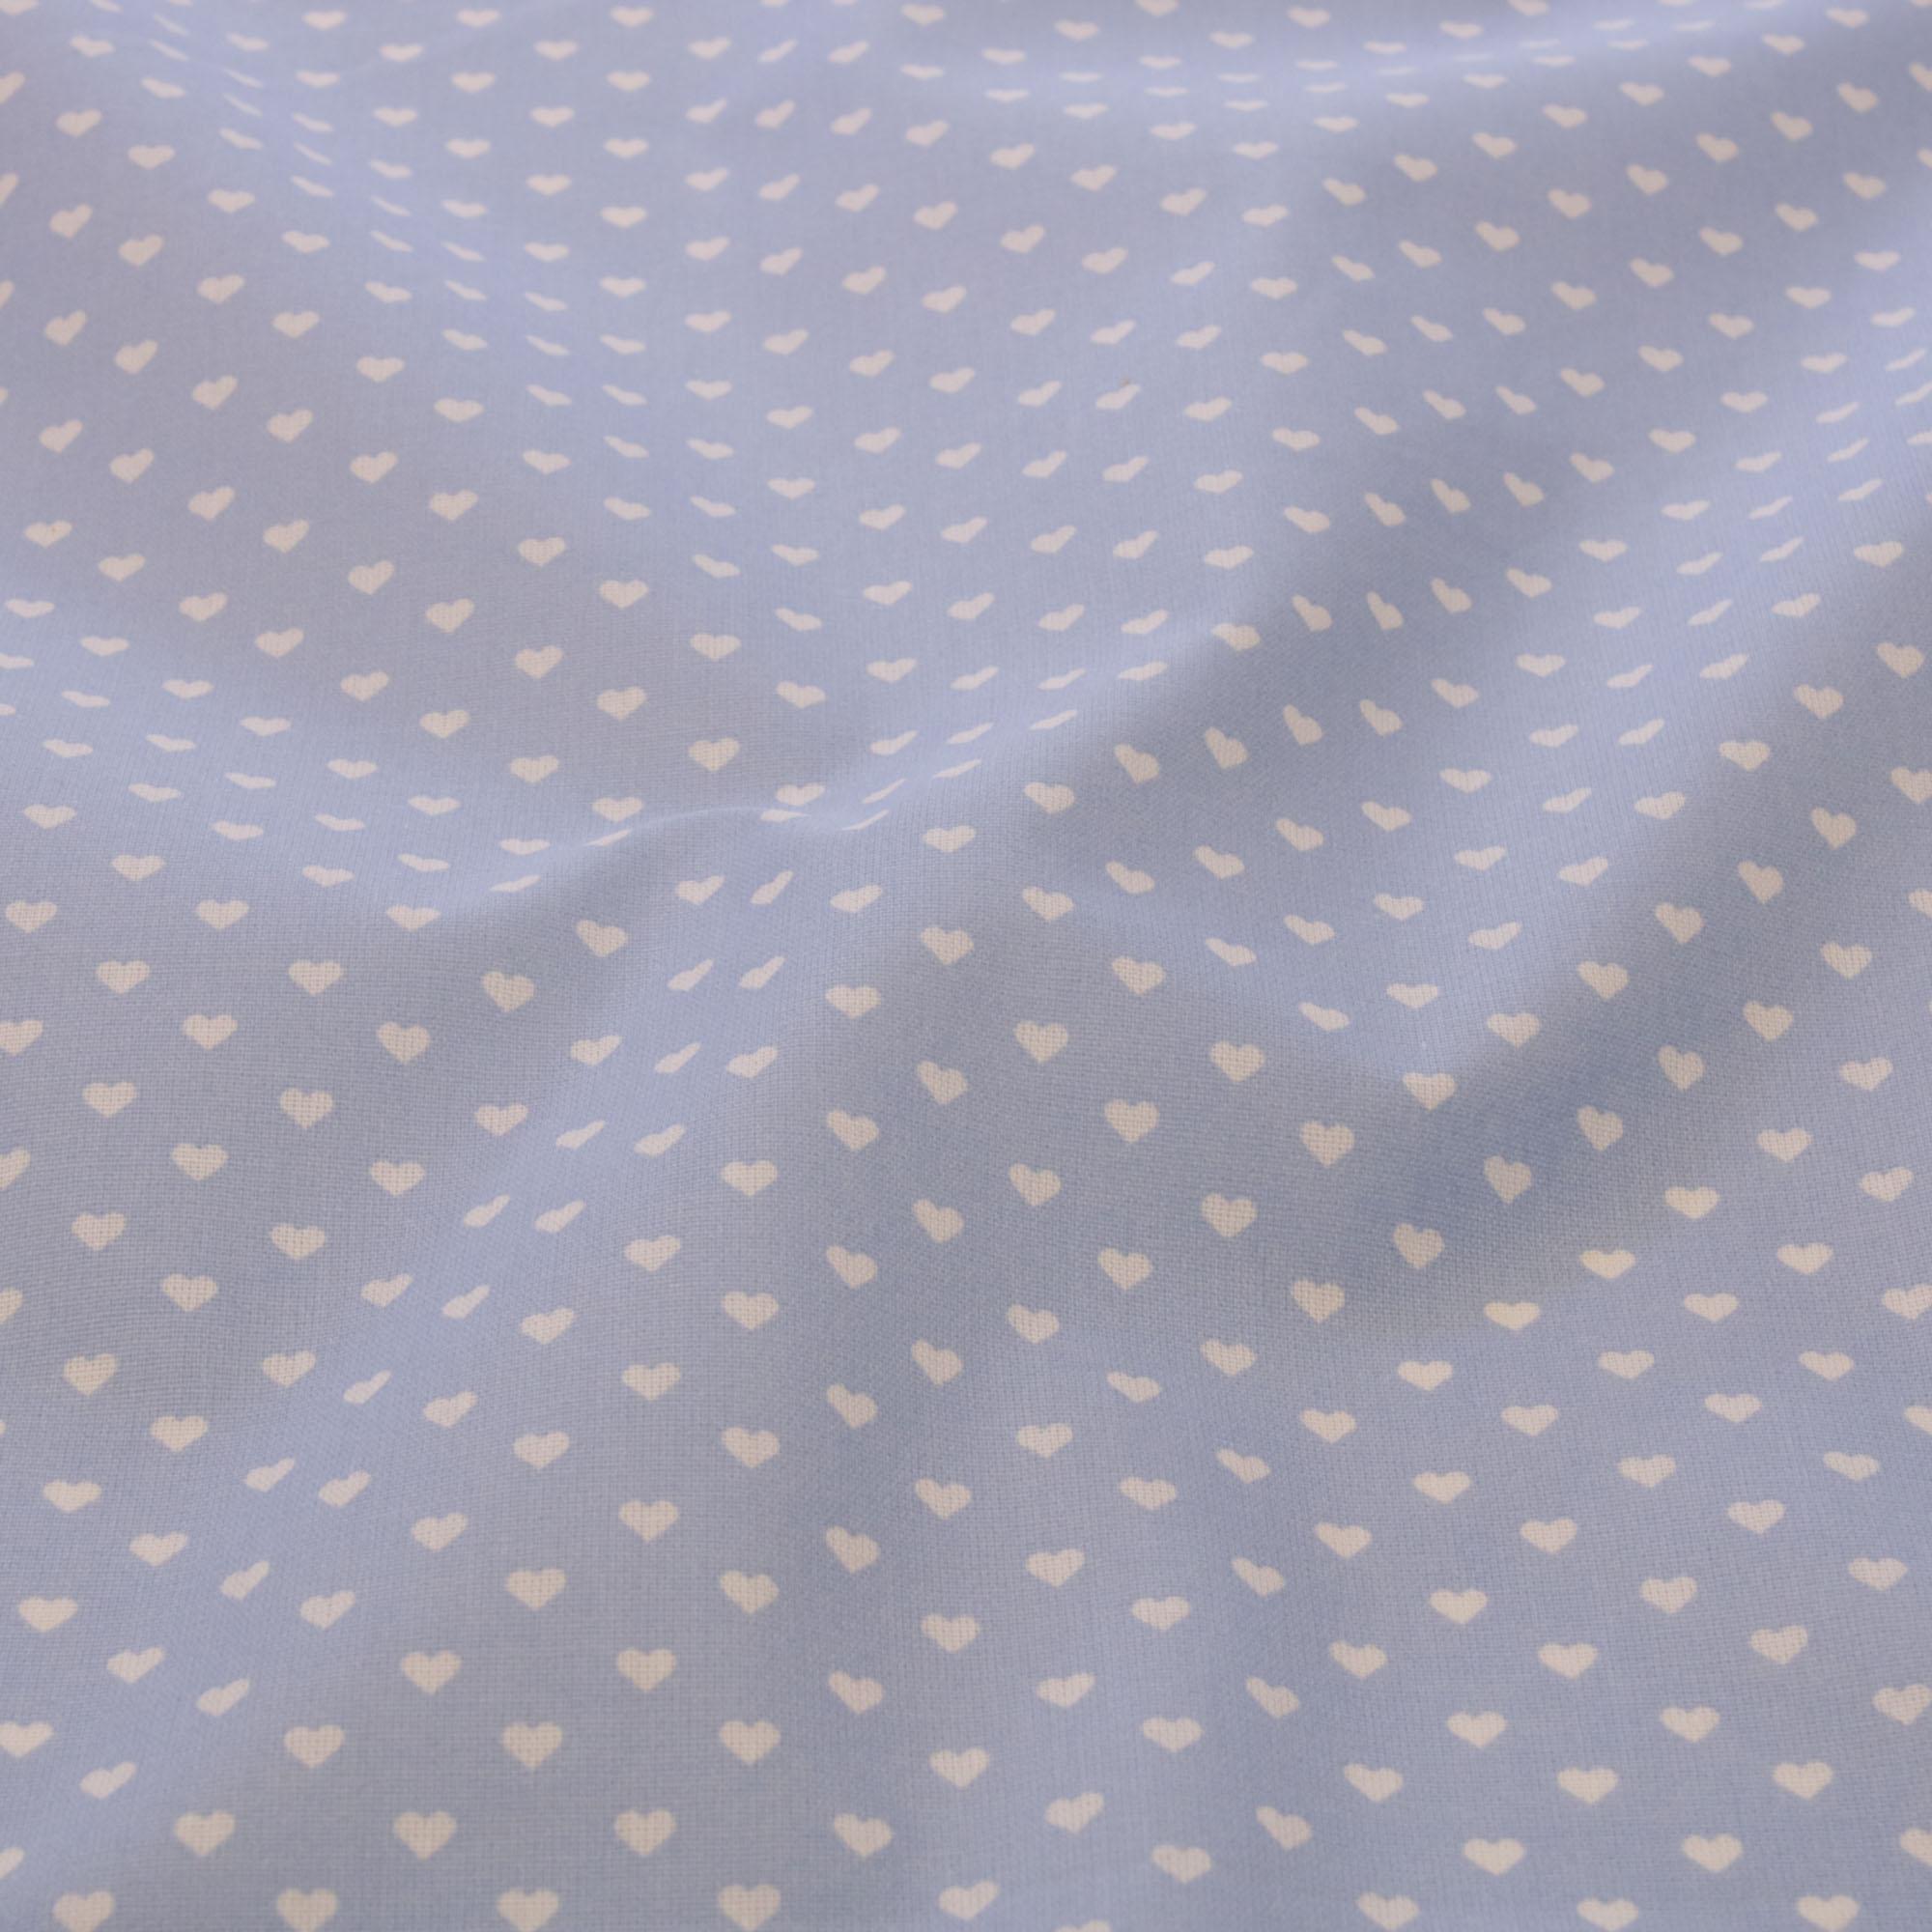 Tecido tricoline estampado coracao 1,40 m largura azul claro